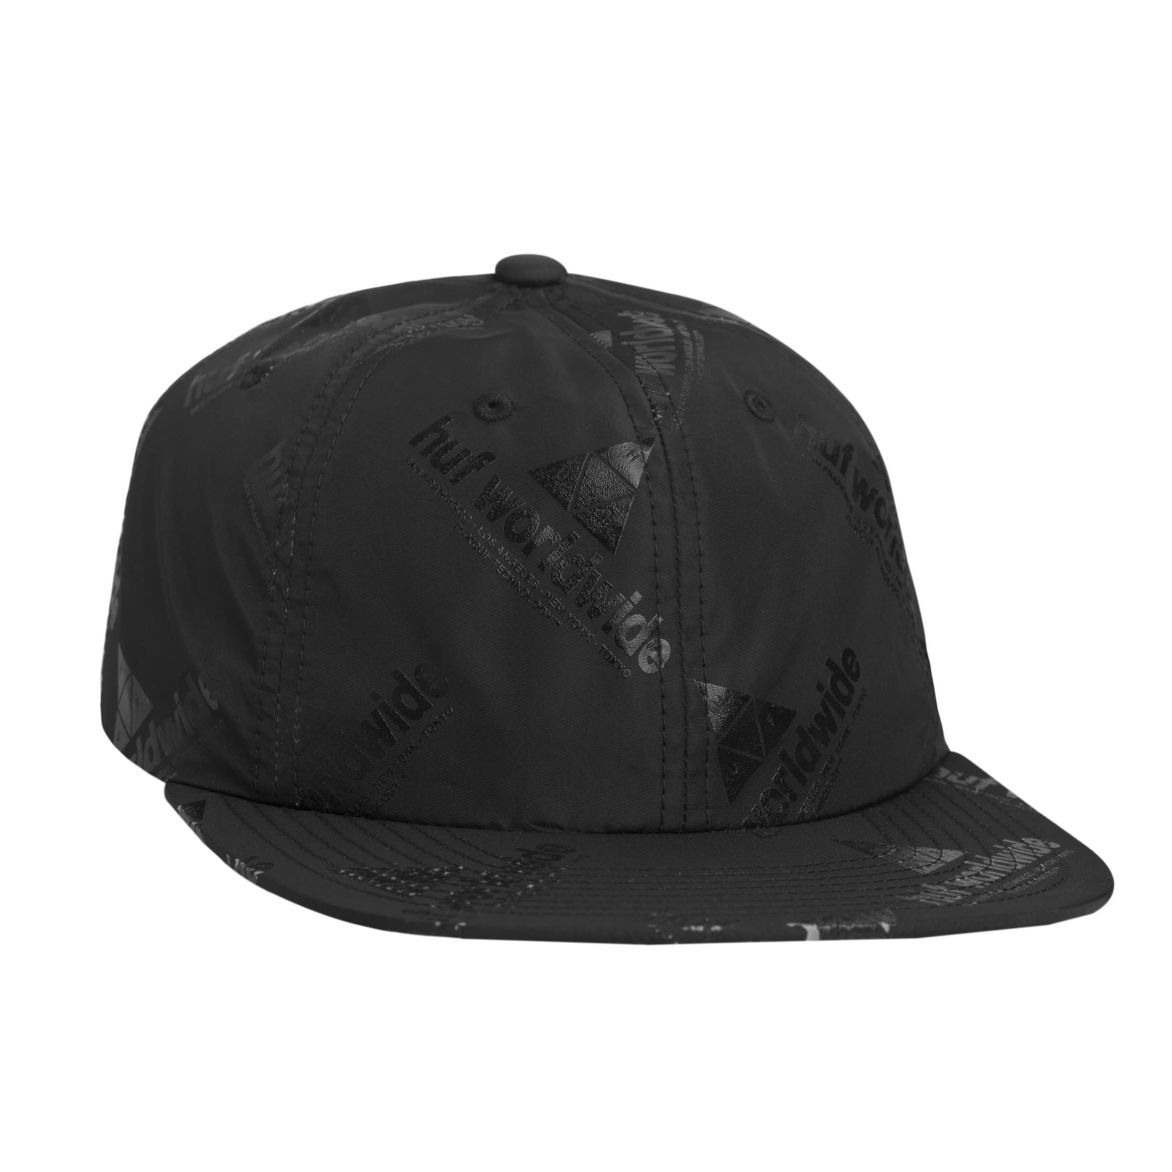 5236b2923dd Peak 6 Panel Hat